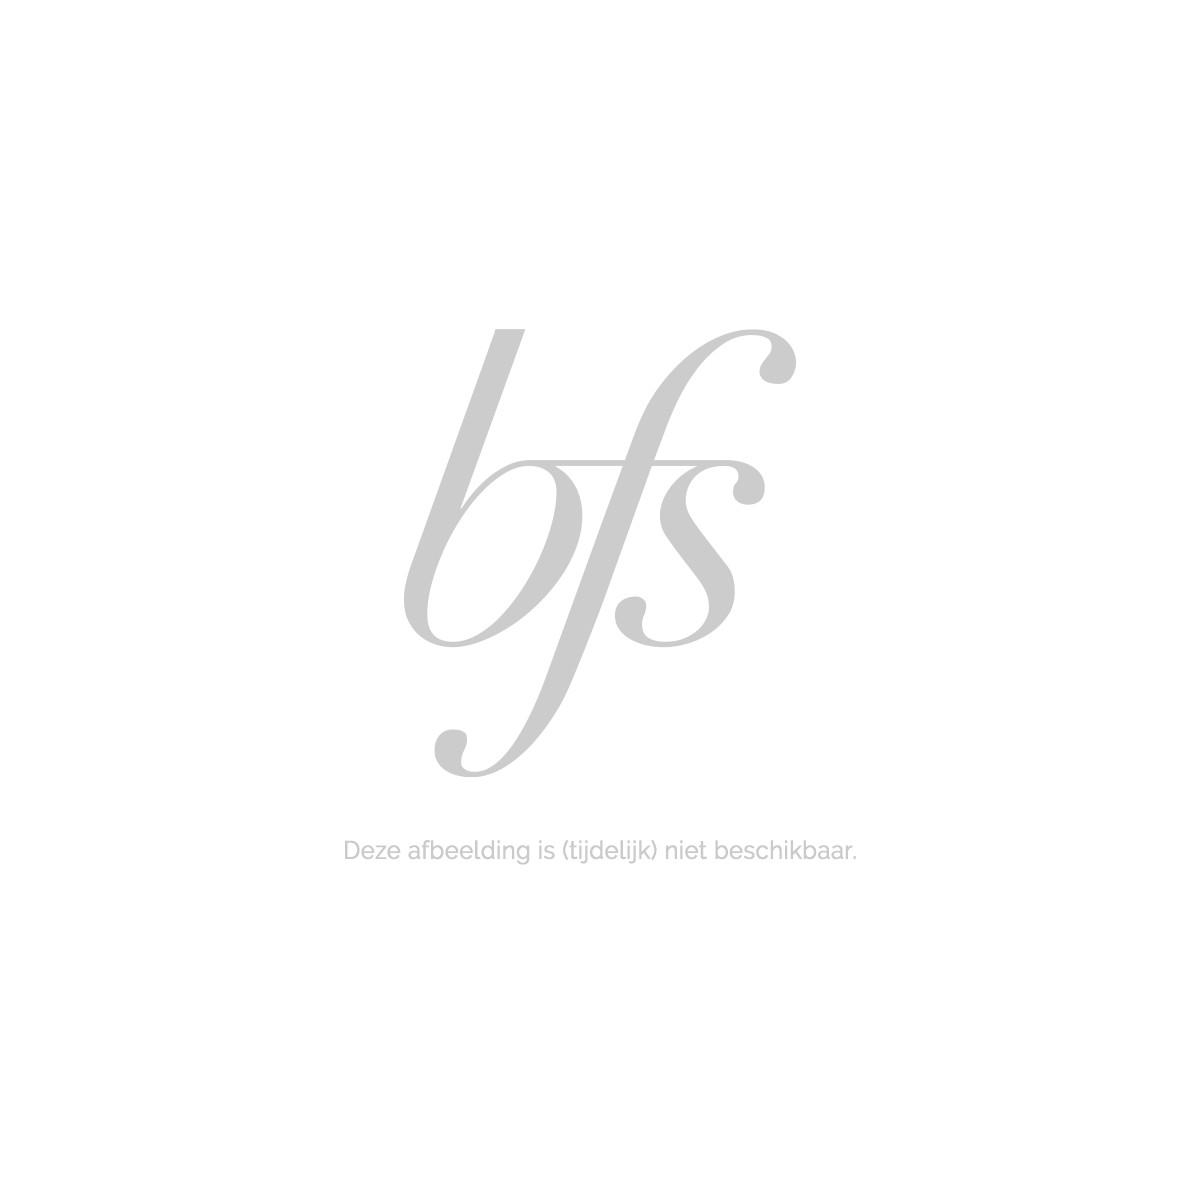 Jil Sander No.4 Moisturizing Body Balm 150 ml